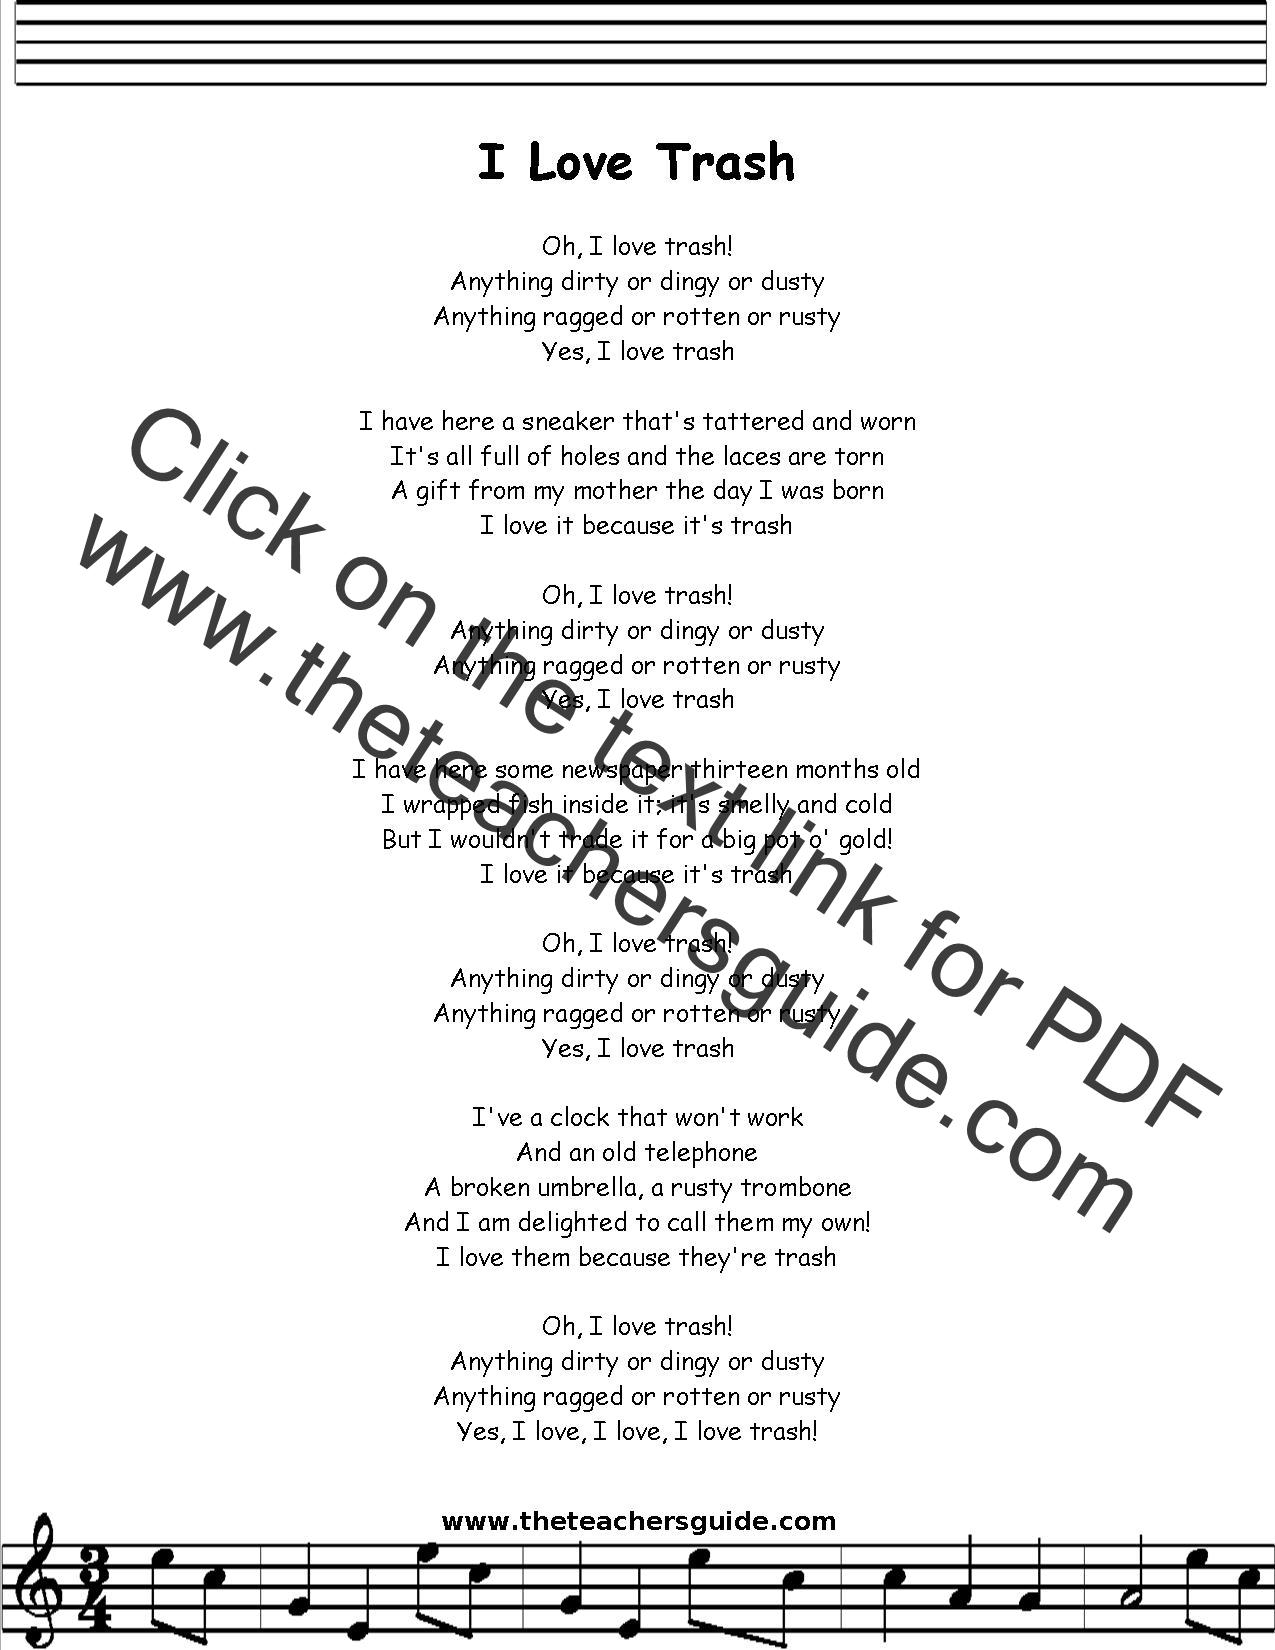 I Love Trash Lyrics Printout Midi And Video